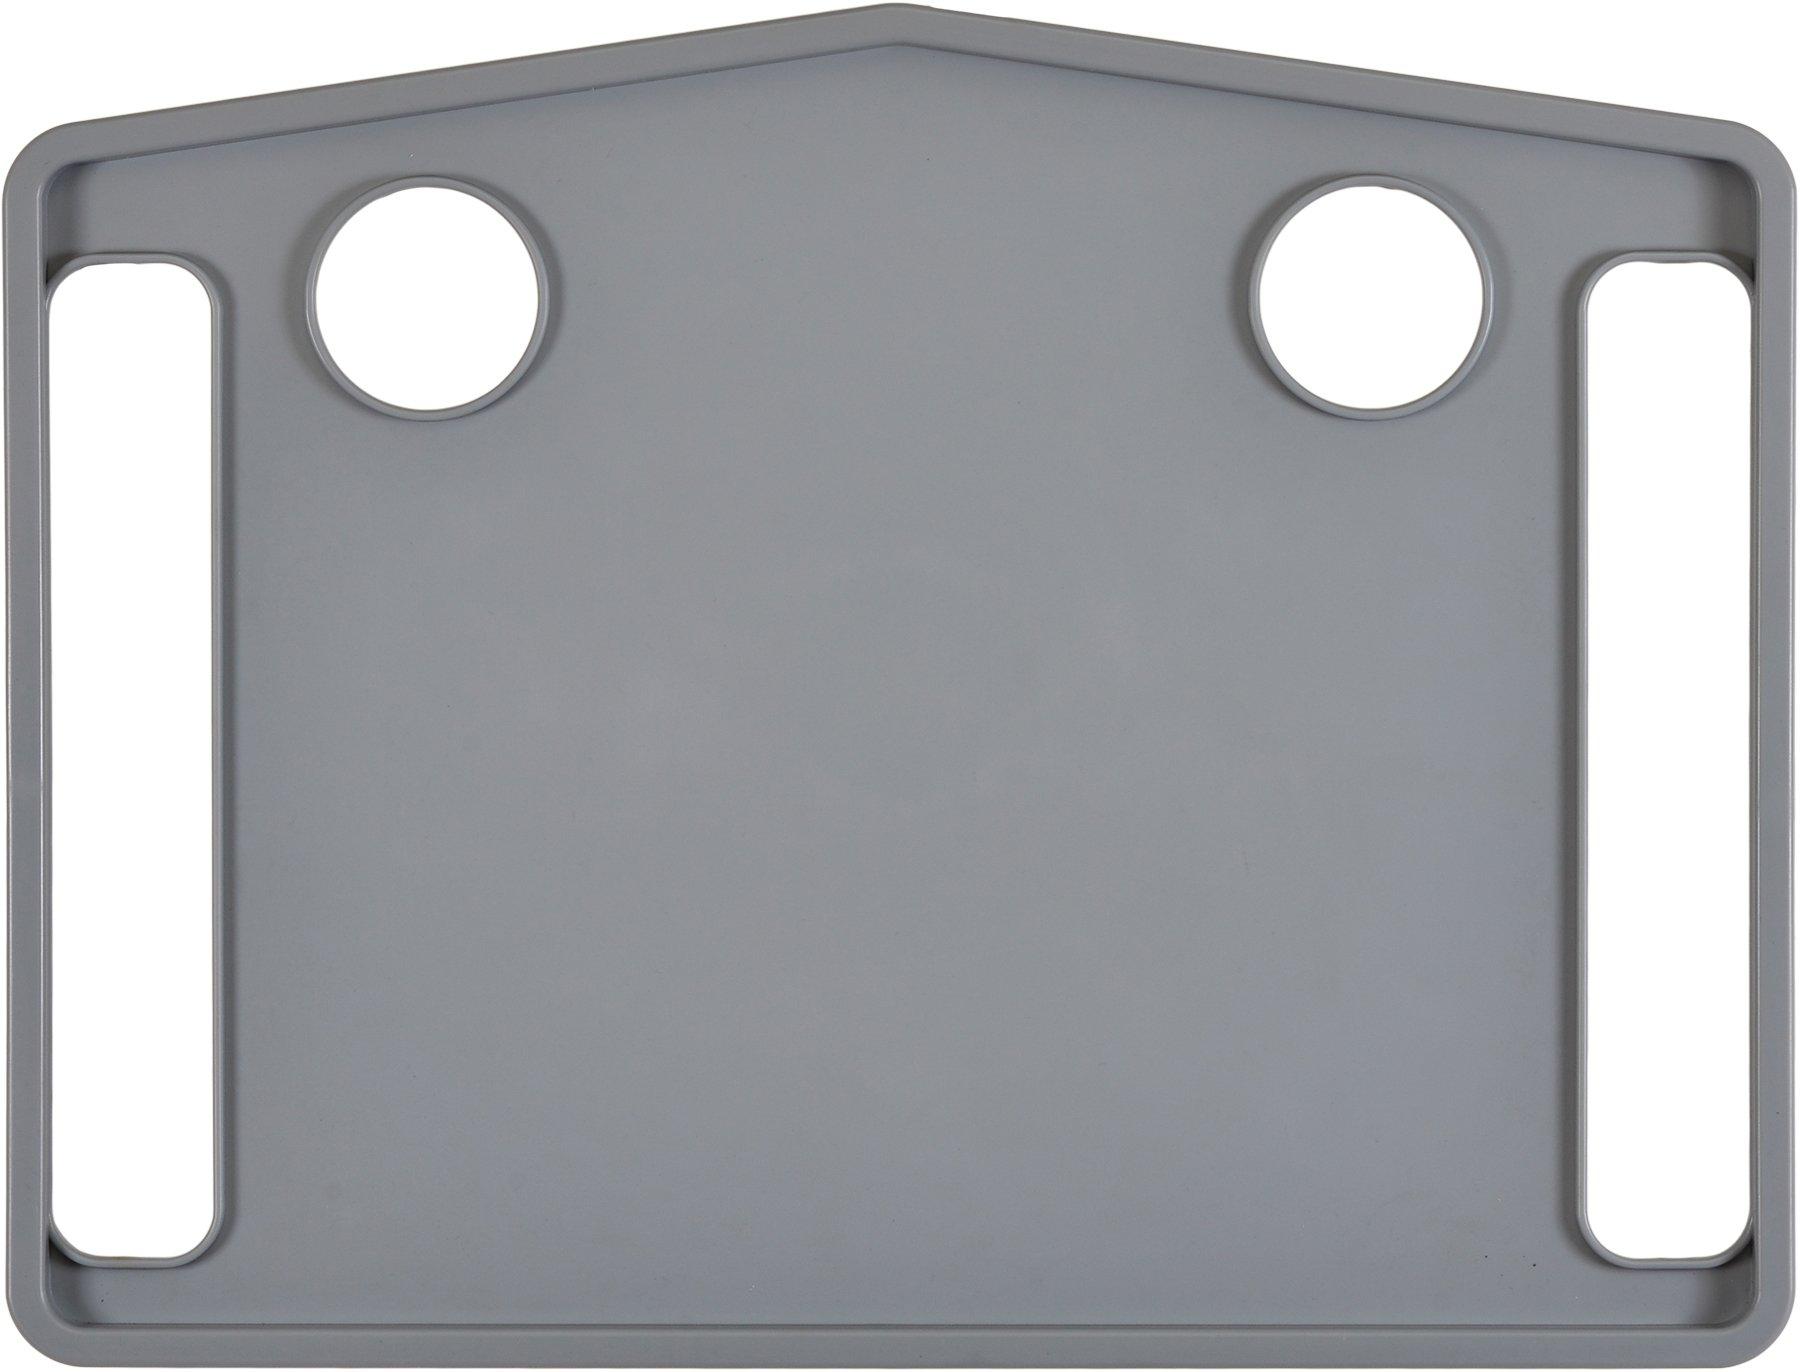 NOVA Medical Products Tray for Folding Walker, Gray, 2 Pound by NOVA Medical Products